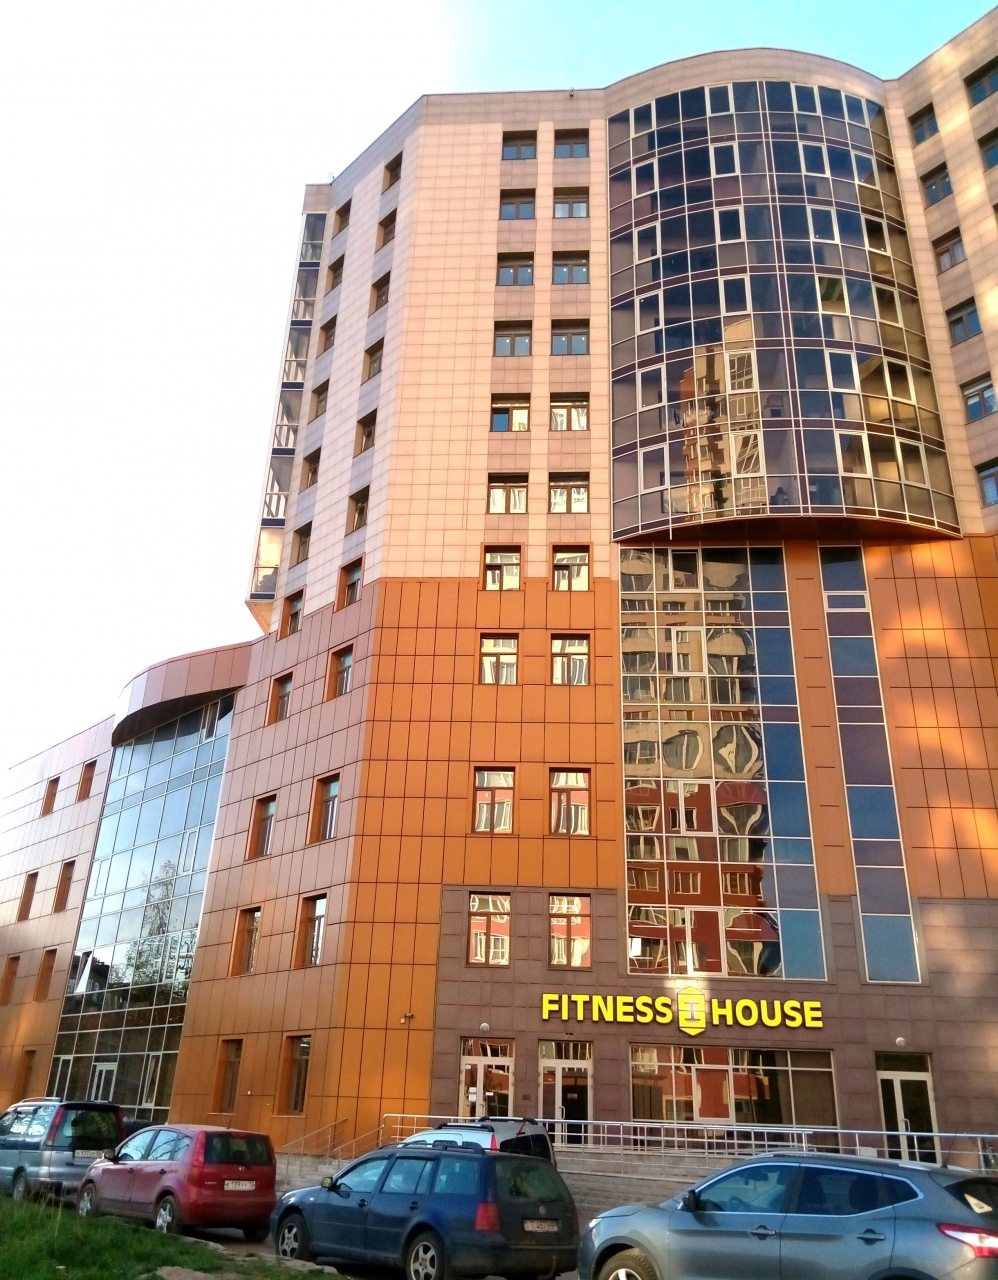 http://nevsky-prostor.pro.bkn.ru/images/s_big/69e869d6-5935-11e8-8936-448a5bd44c07.jpg